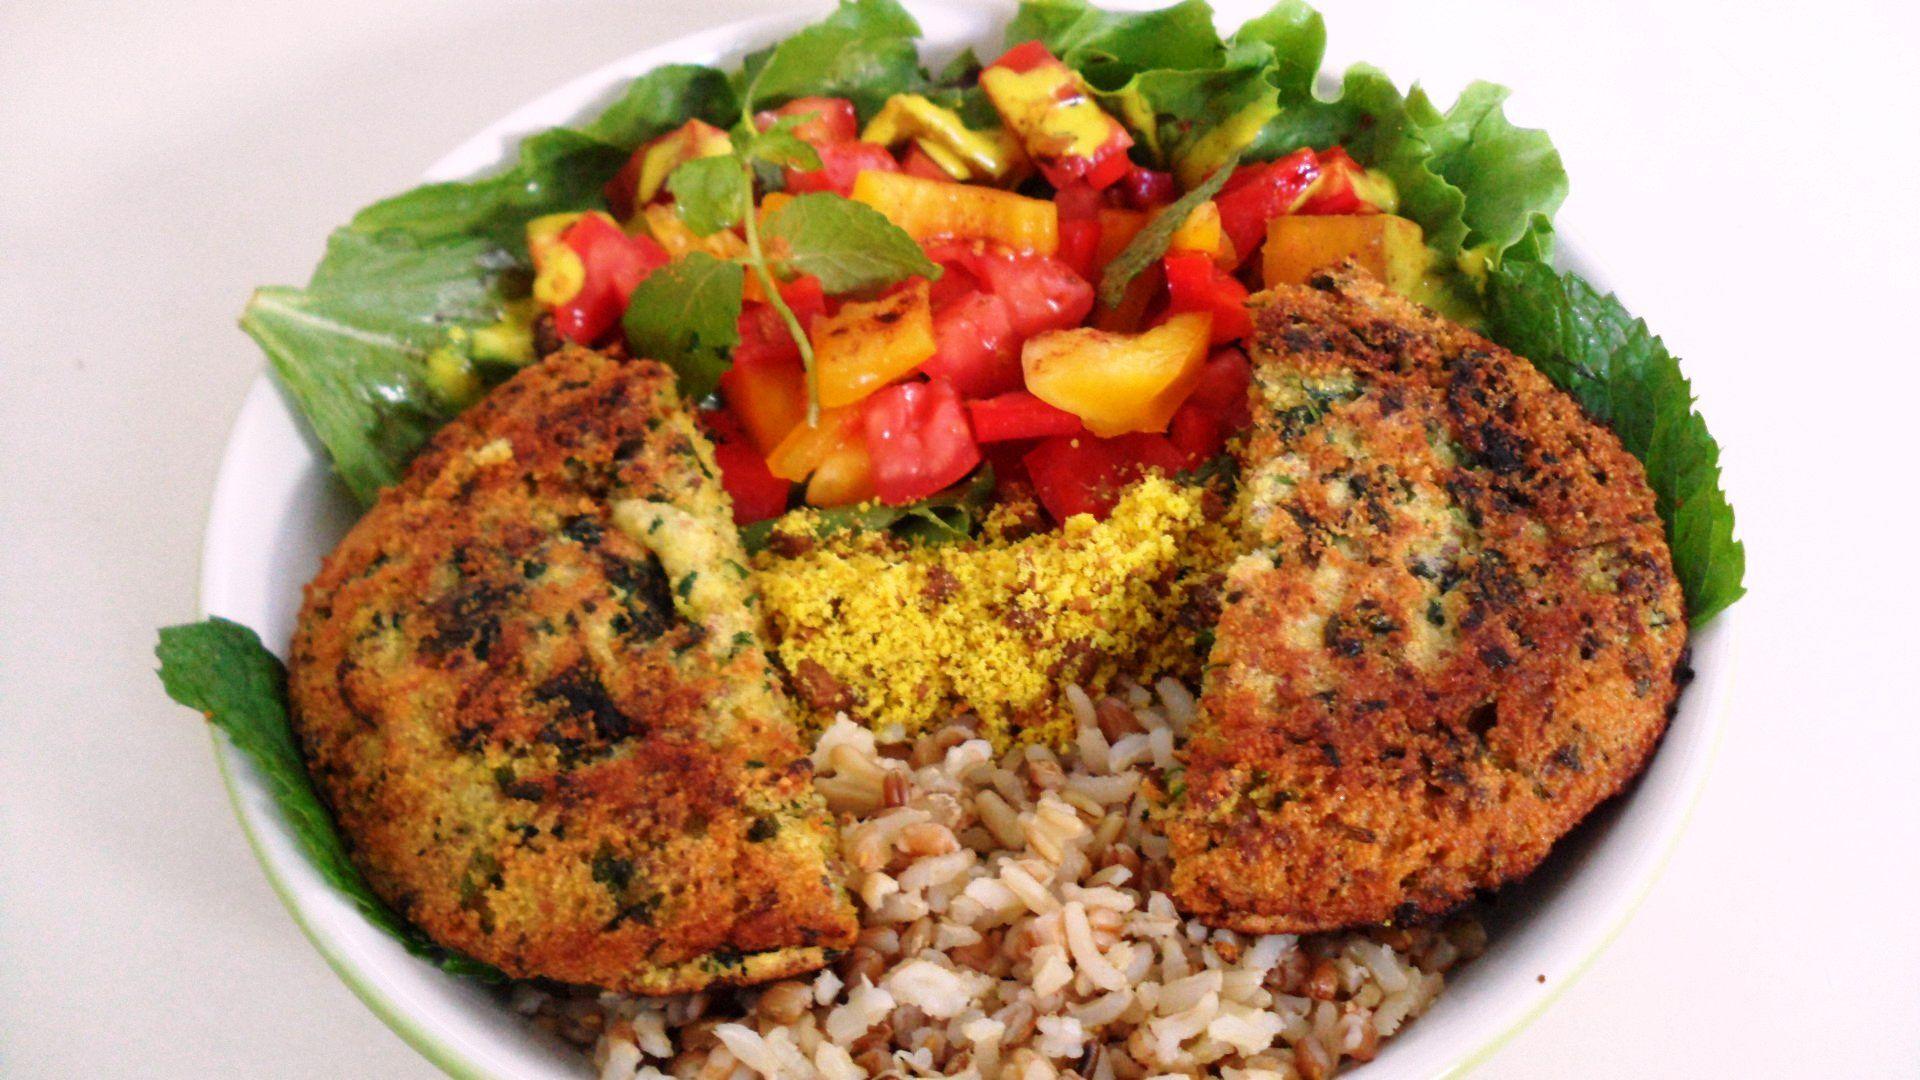 Comida vegetariana comida vegetariana pinterest - Comidas vegetarianas ricas ...